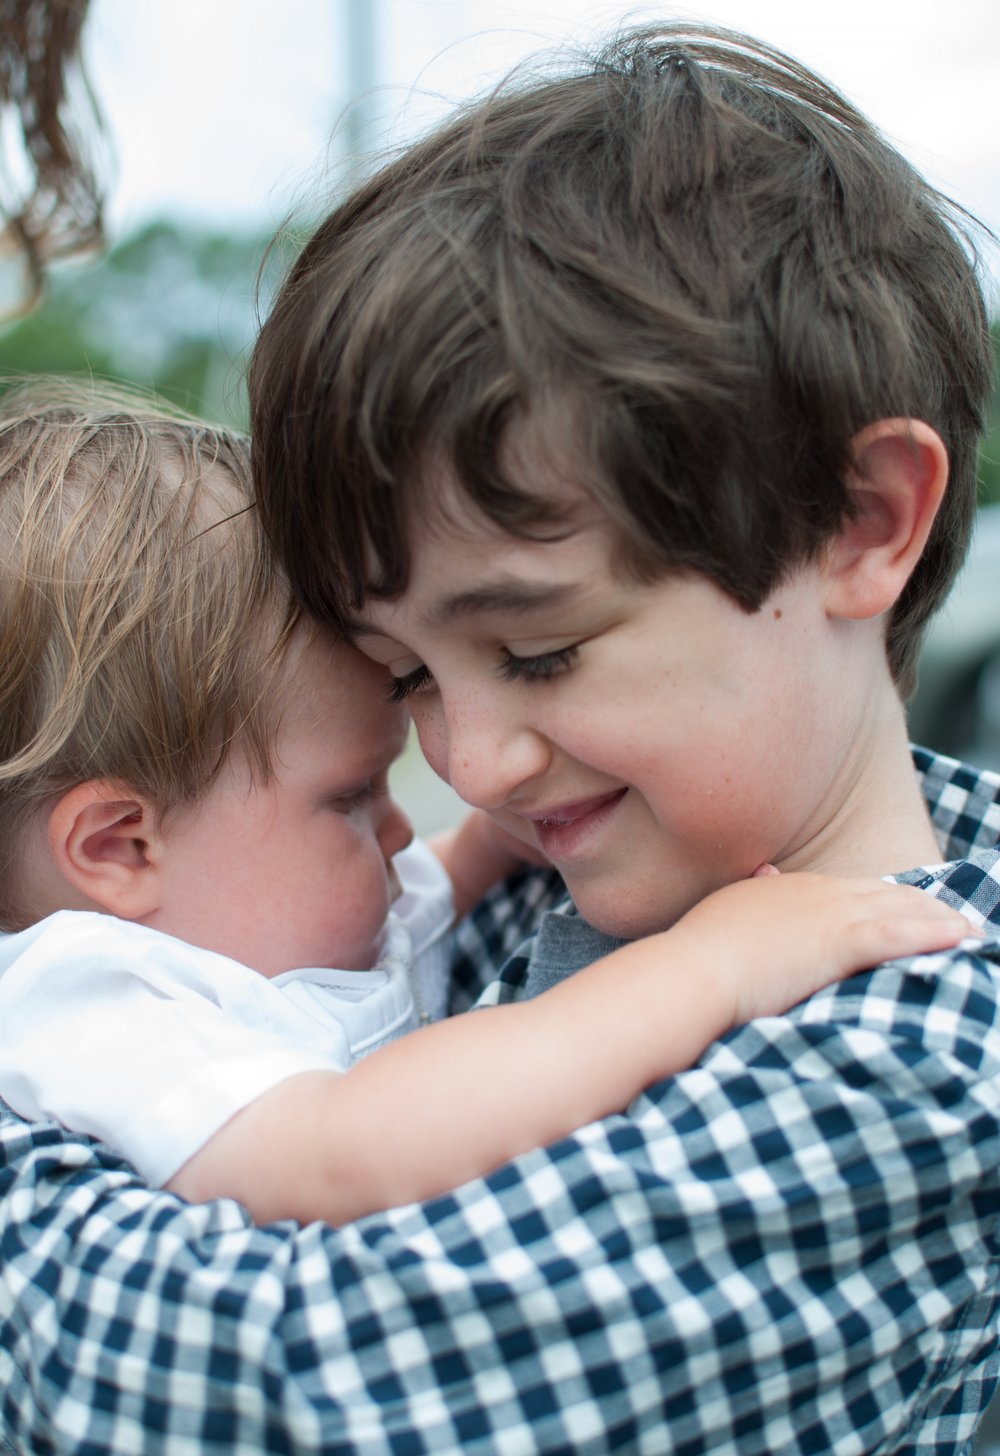 Owen holding Kyle